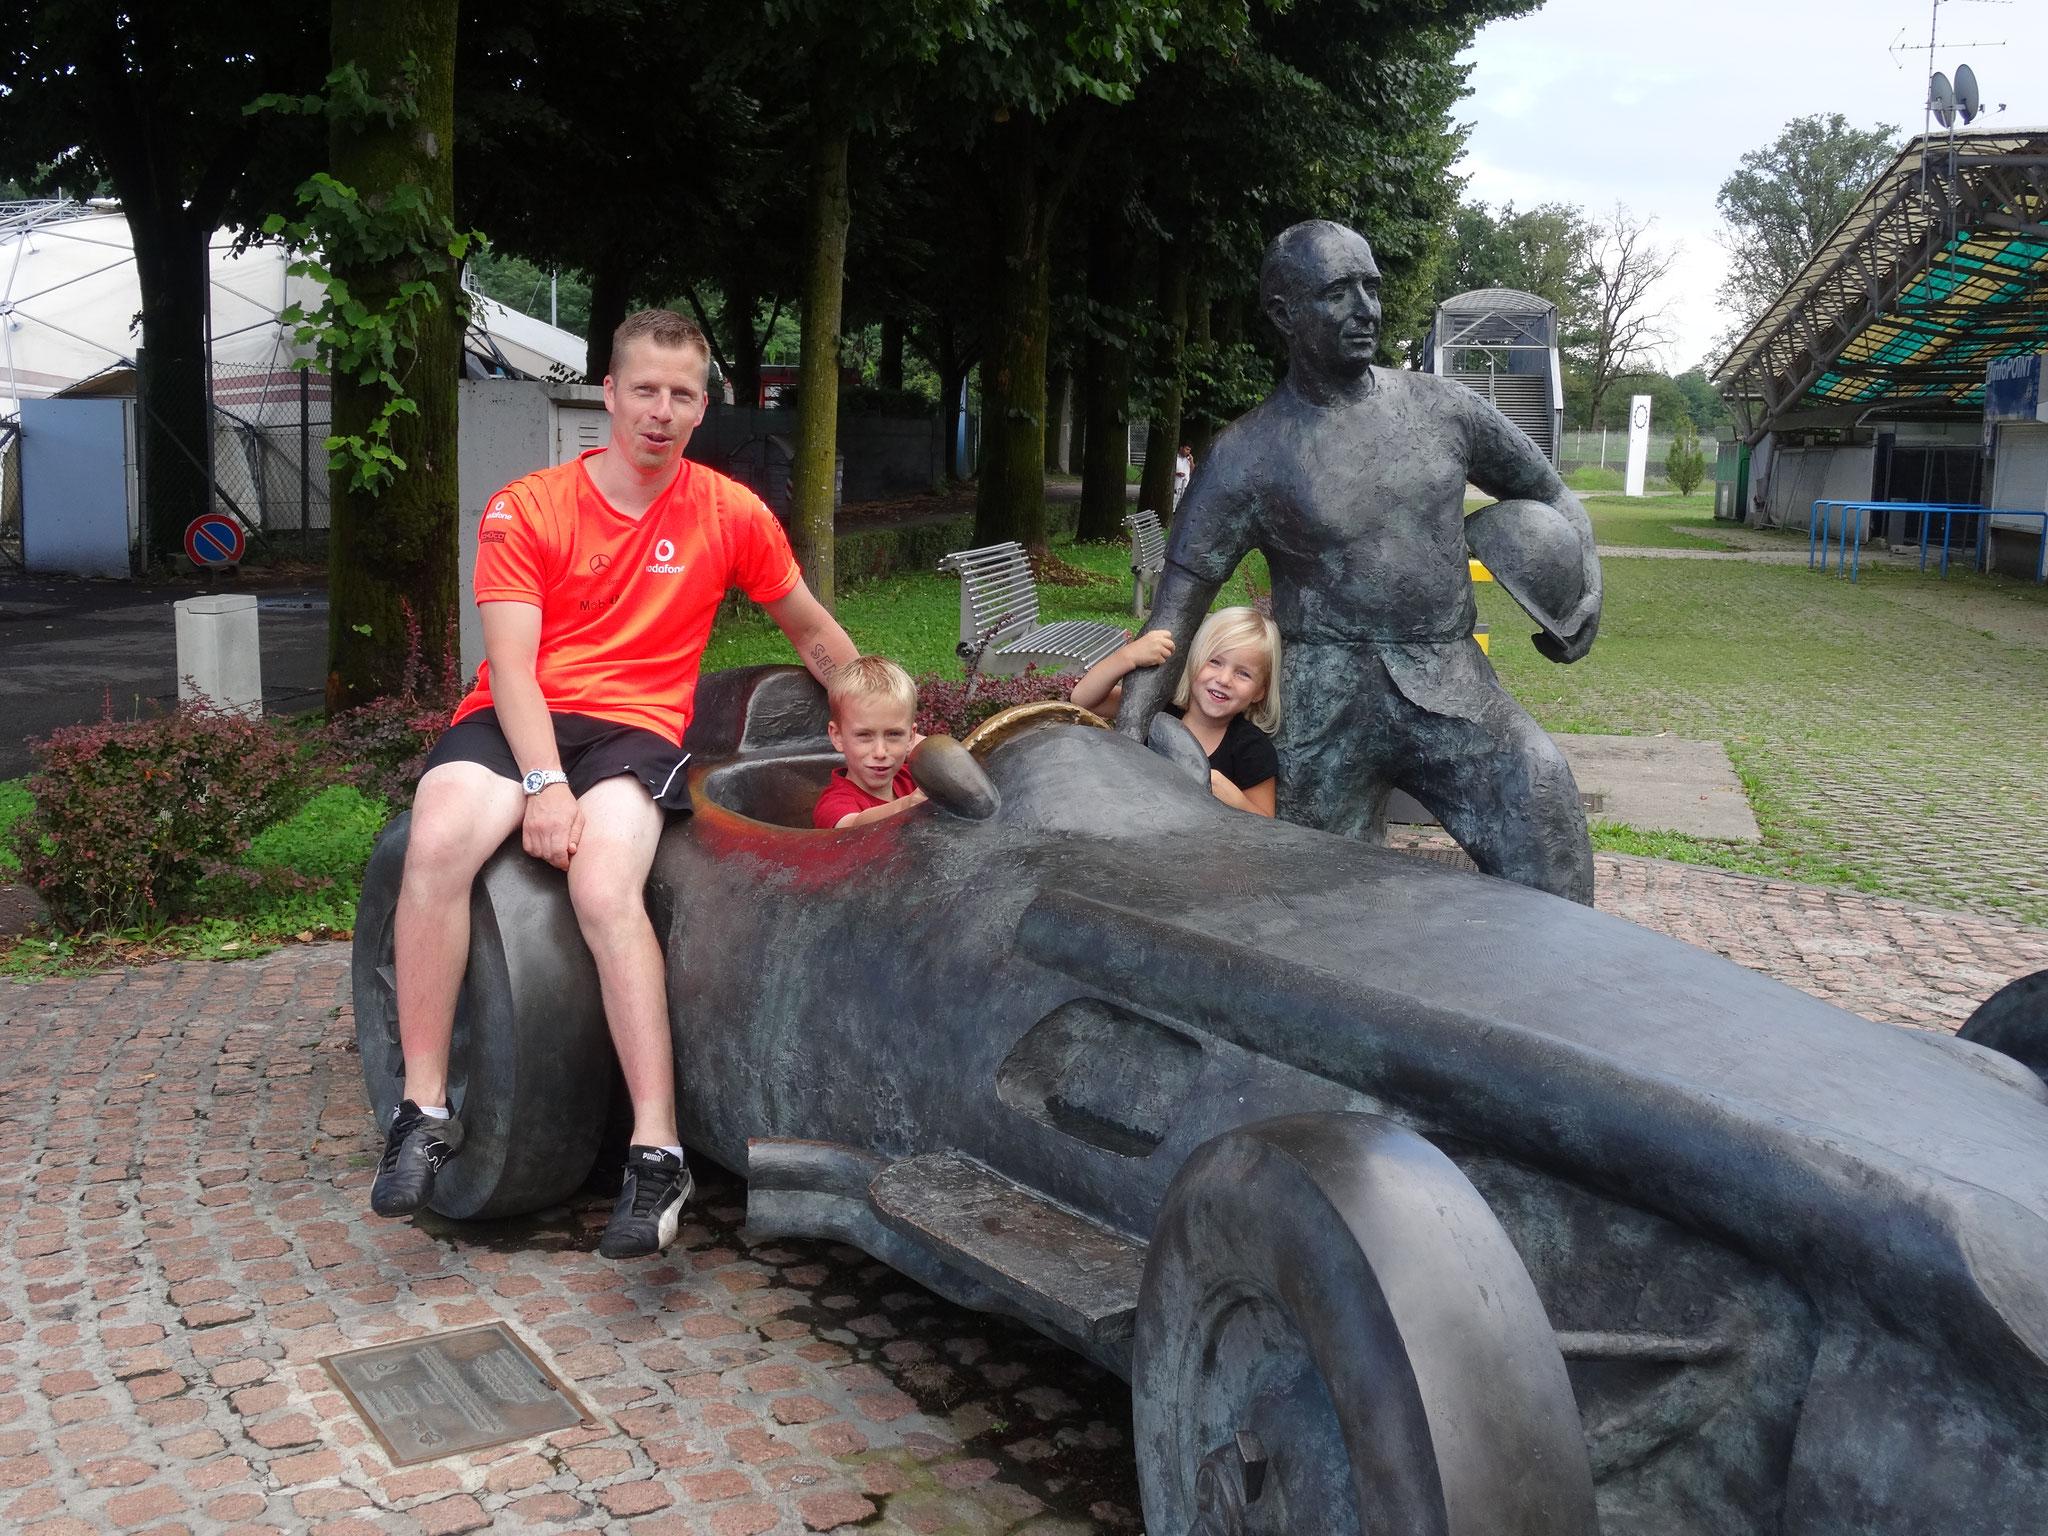 2014: Circuit Monza bezocht